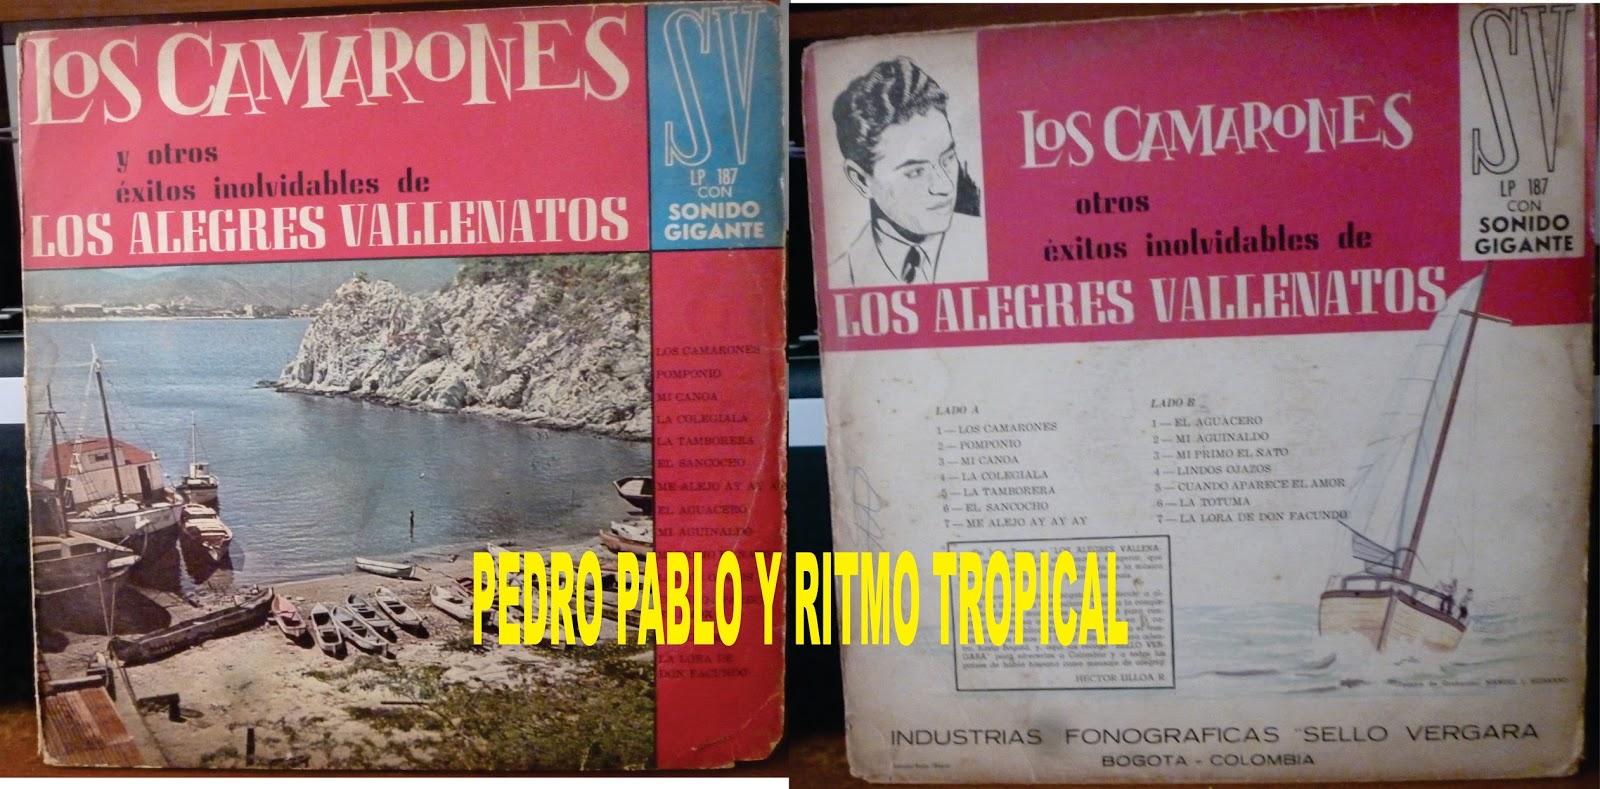 TROPICALES DEL RECUERDO: Bovea y Sus Vallenatos - Alegría Del boni williamhill wie man geld einzahlen auf williamhill Caribe